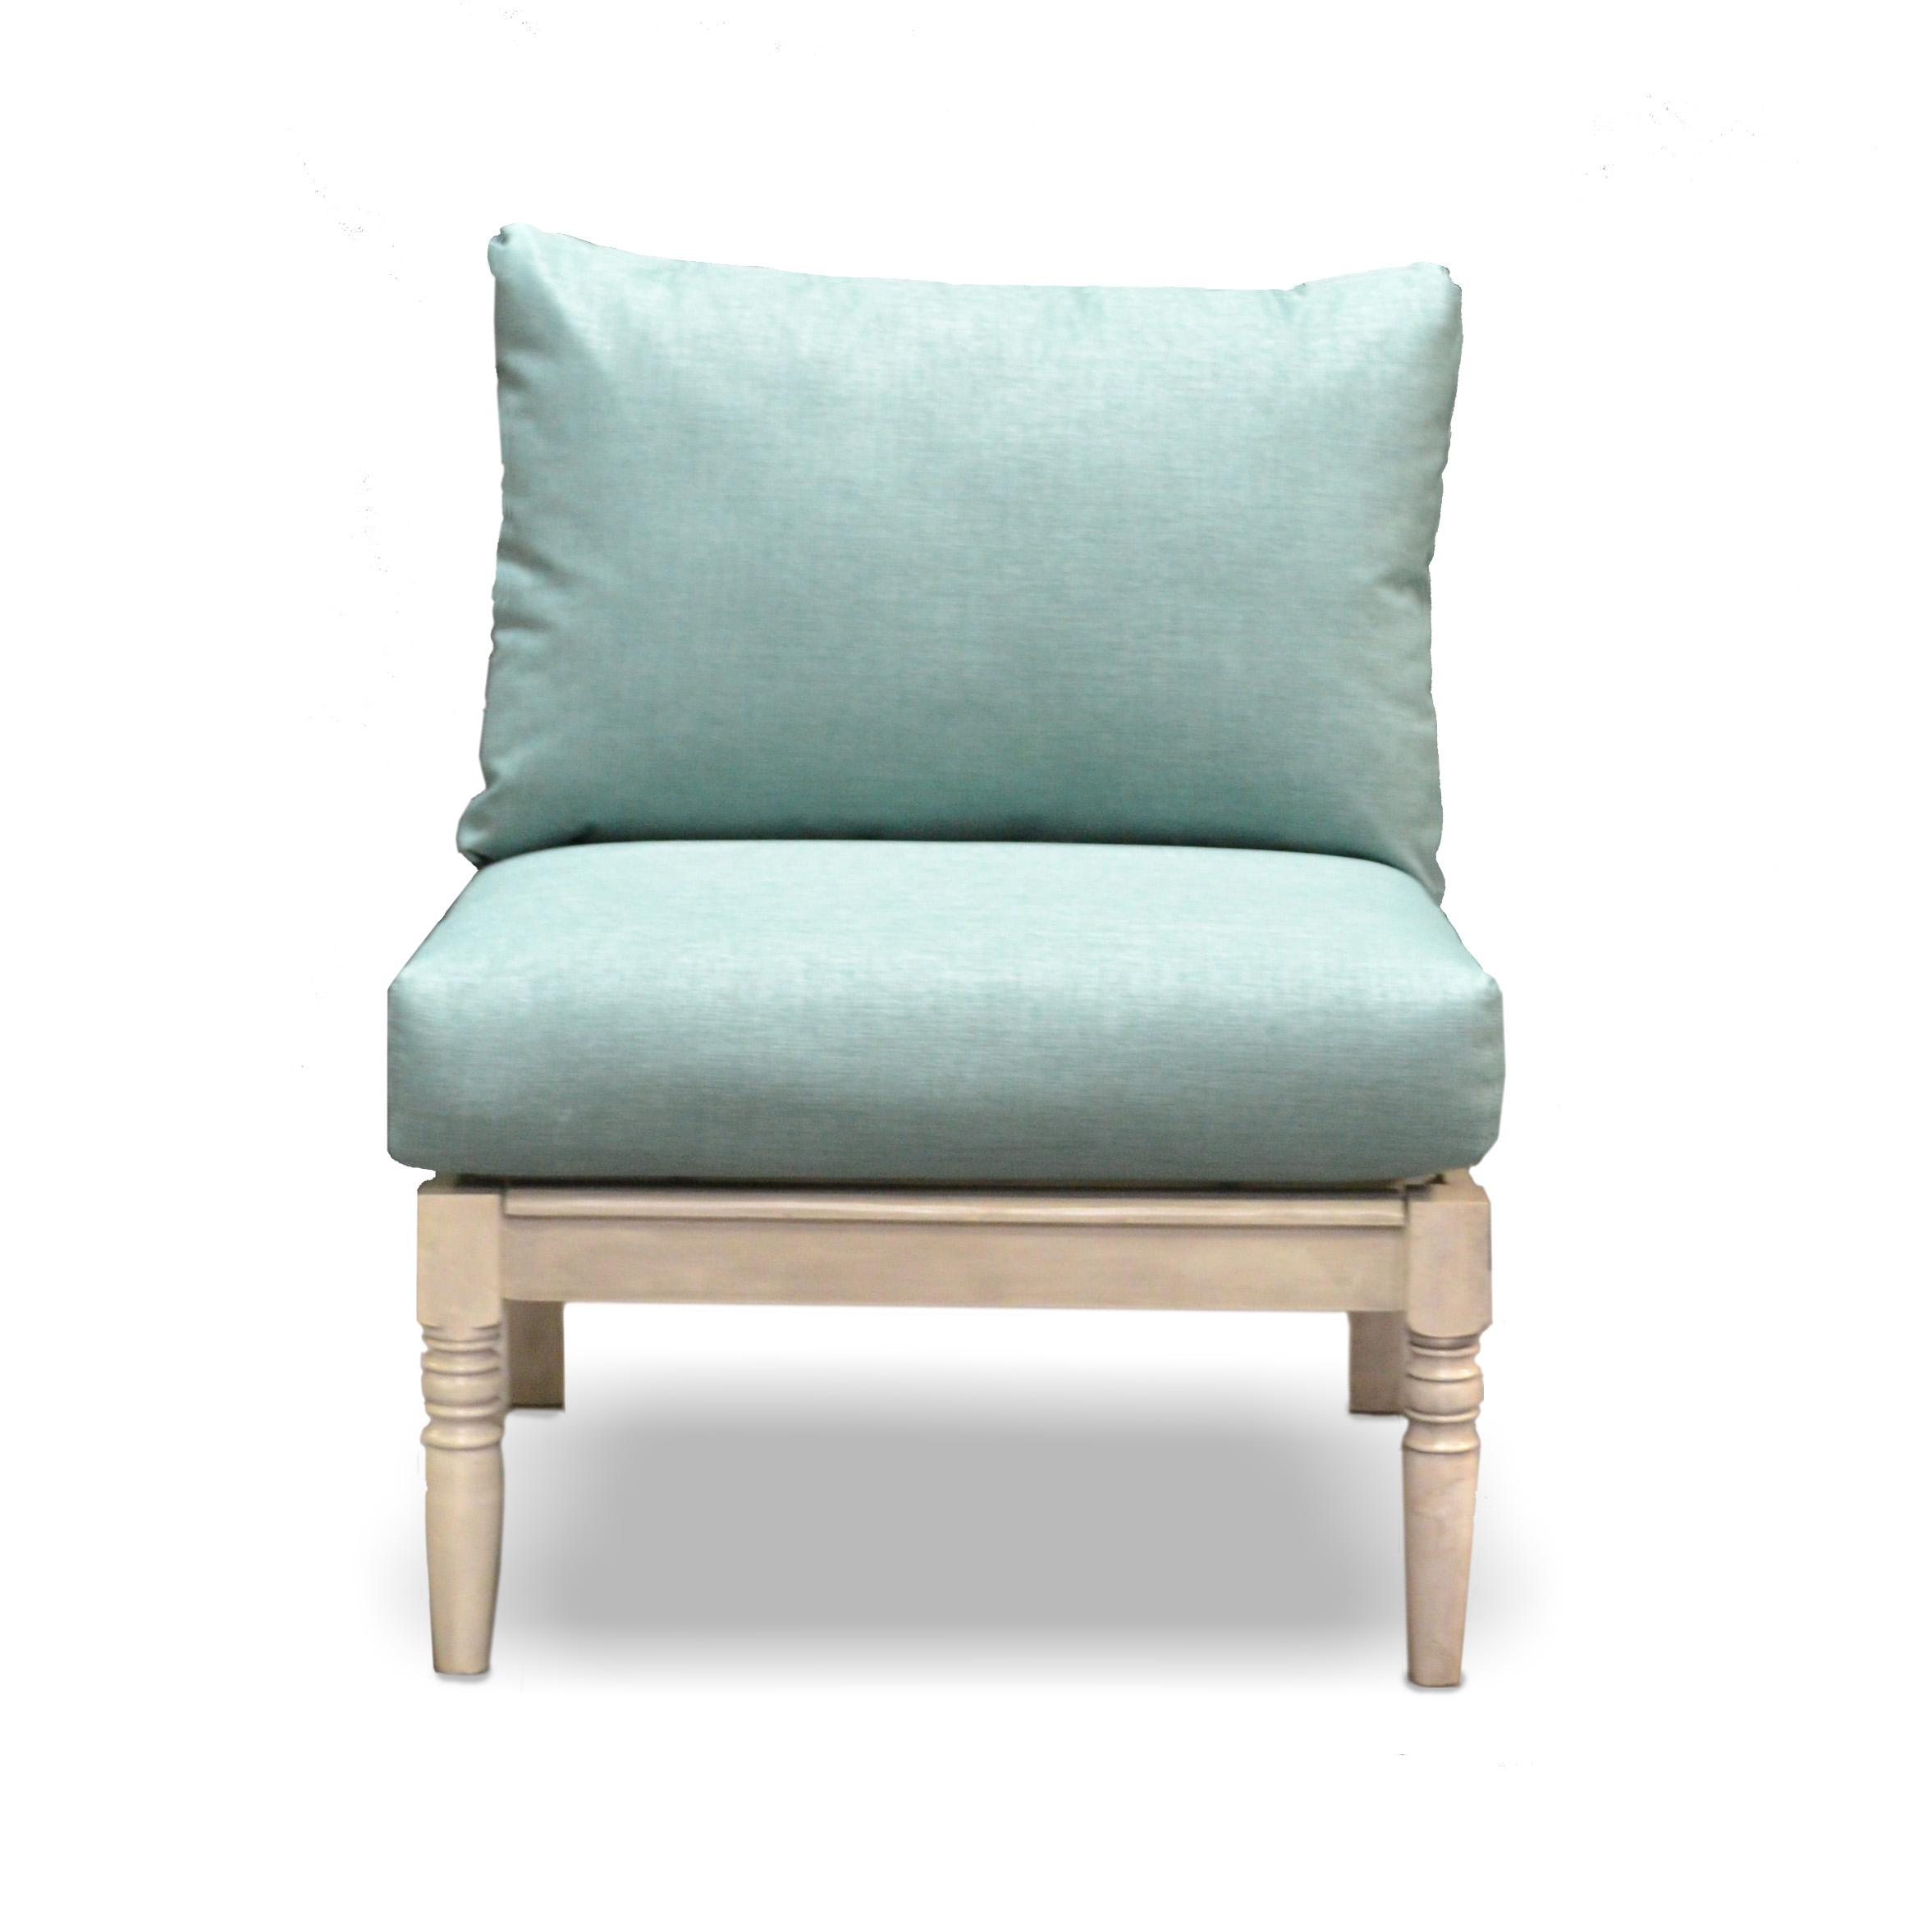 Designer8 Hamptons Armless Chair Designer8